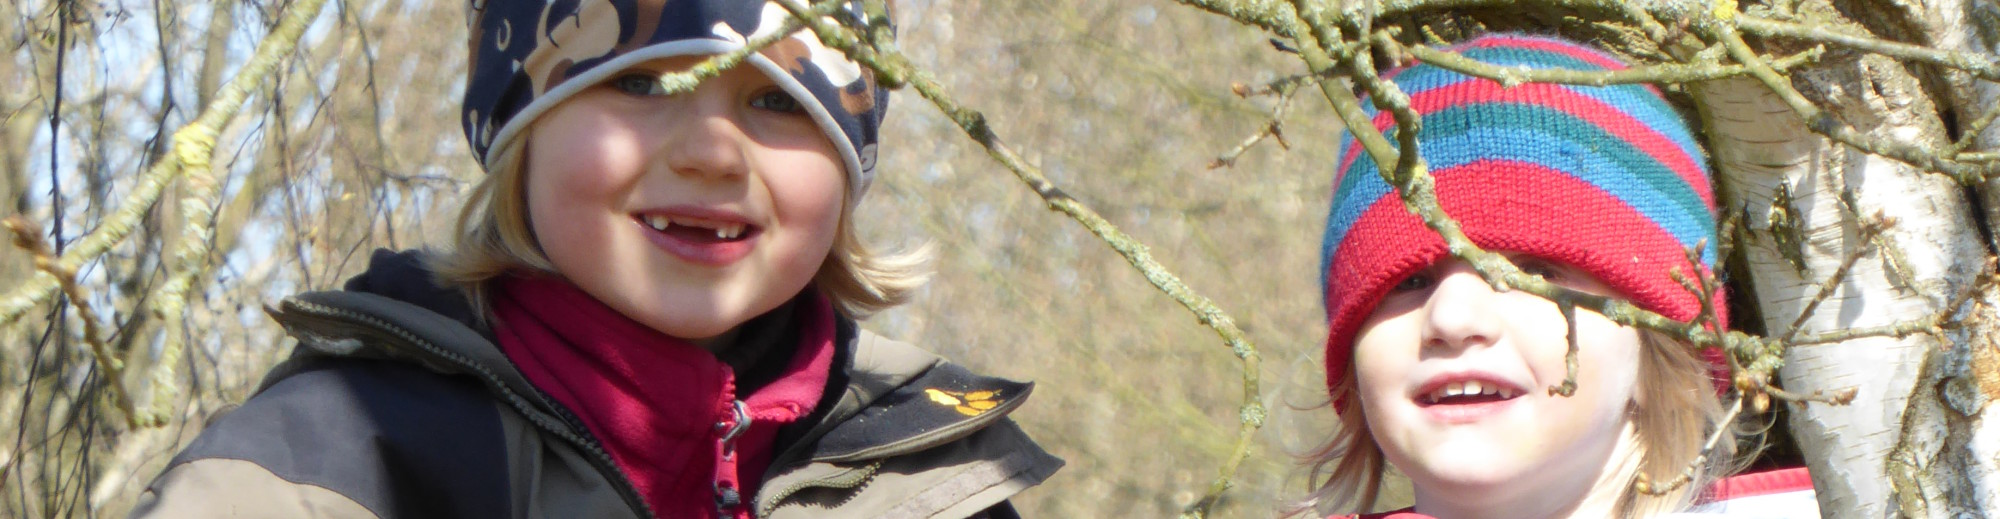 Waldkindergarten Gellersen